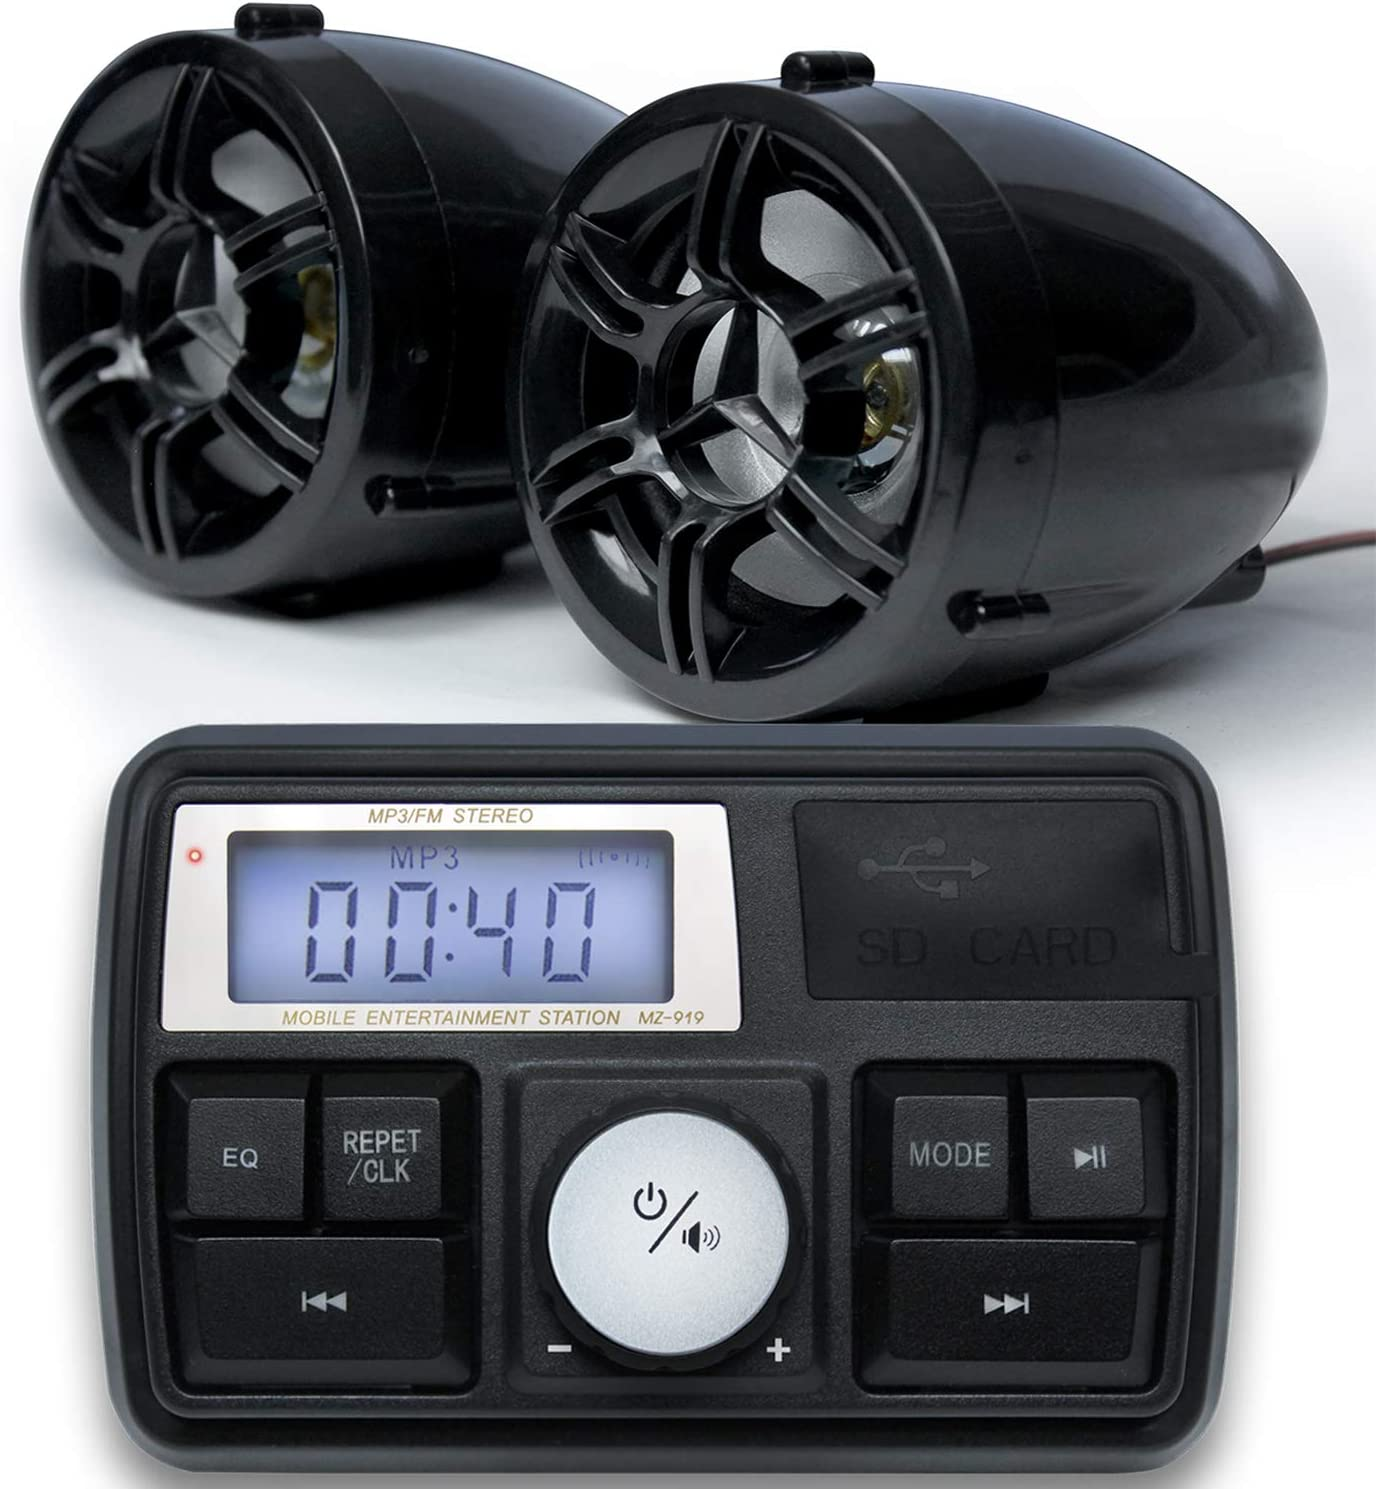 RE8 Handlebar Mount MP3 Music Player Audio Amplifier System ATV 4-Wheelers USB FM Radio GoHawk Waterproof Bluetooth Motorcycle Stereo Speakers LED Soundbar 7//8-1.25 in AUX